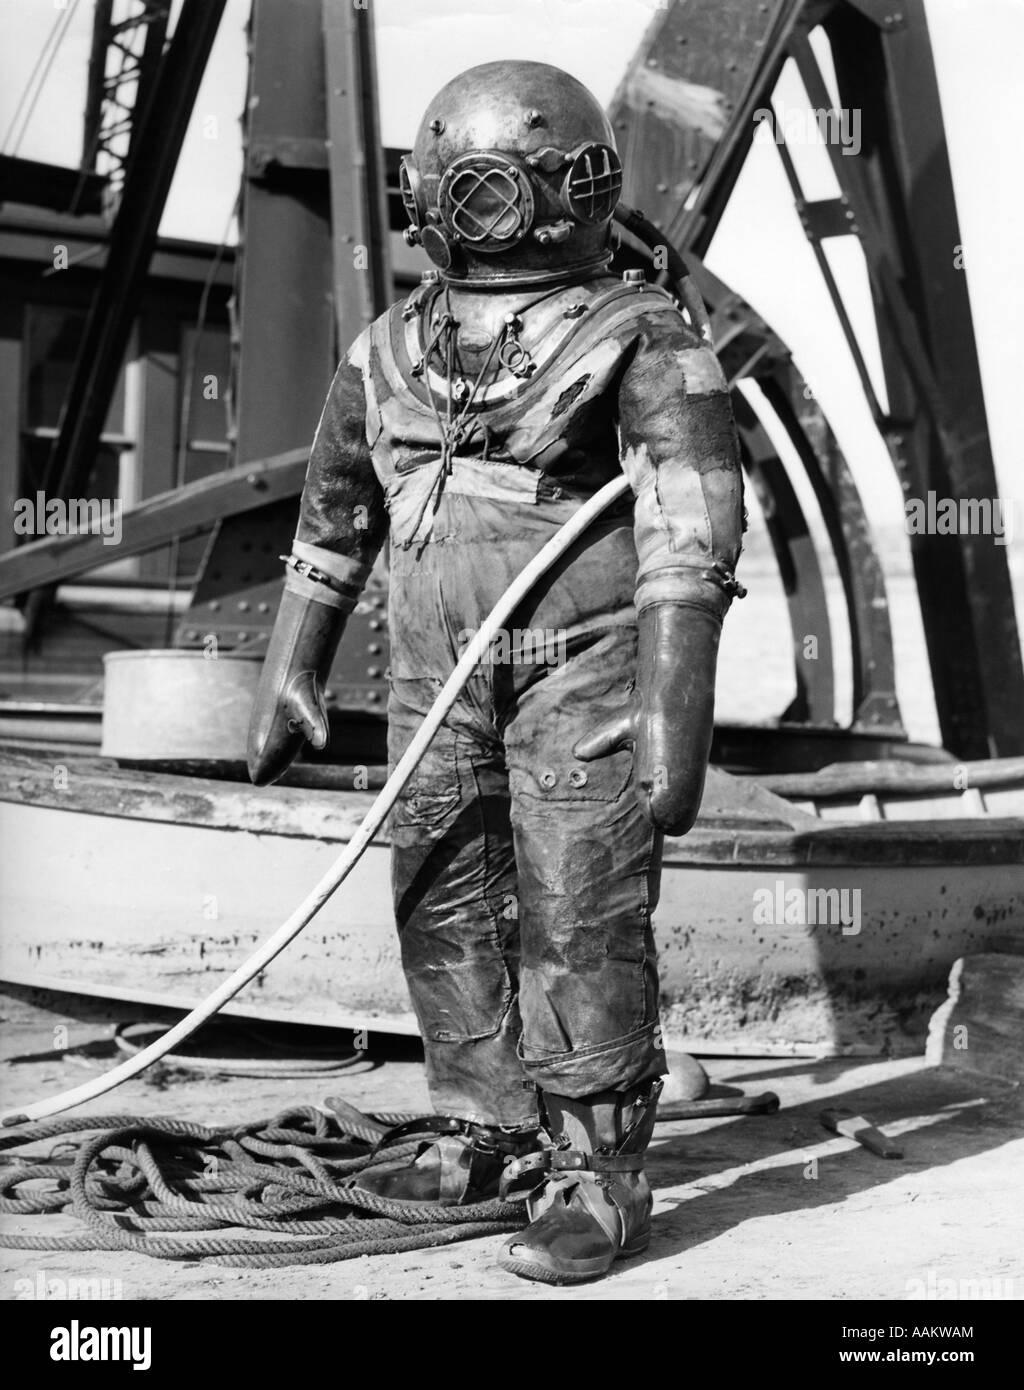 1930s 1940s FULL FIGURE OF MAN IN UNDERWATER HARD HAT DEEP SEA DIVING SUIT Stock Photo